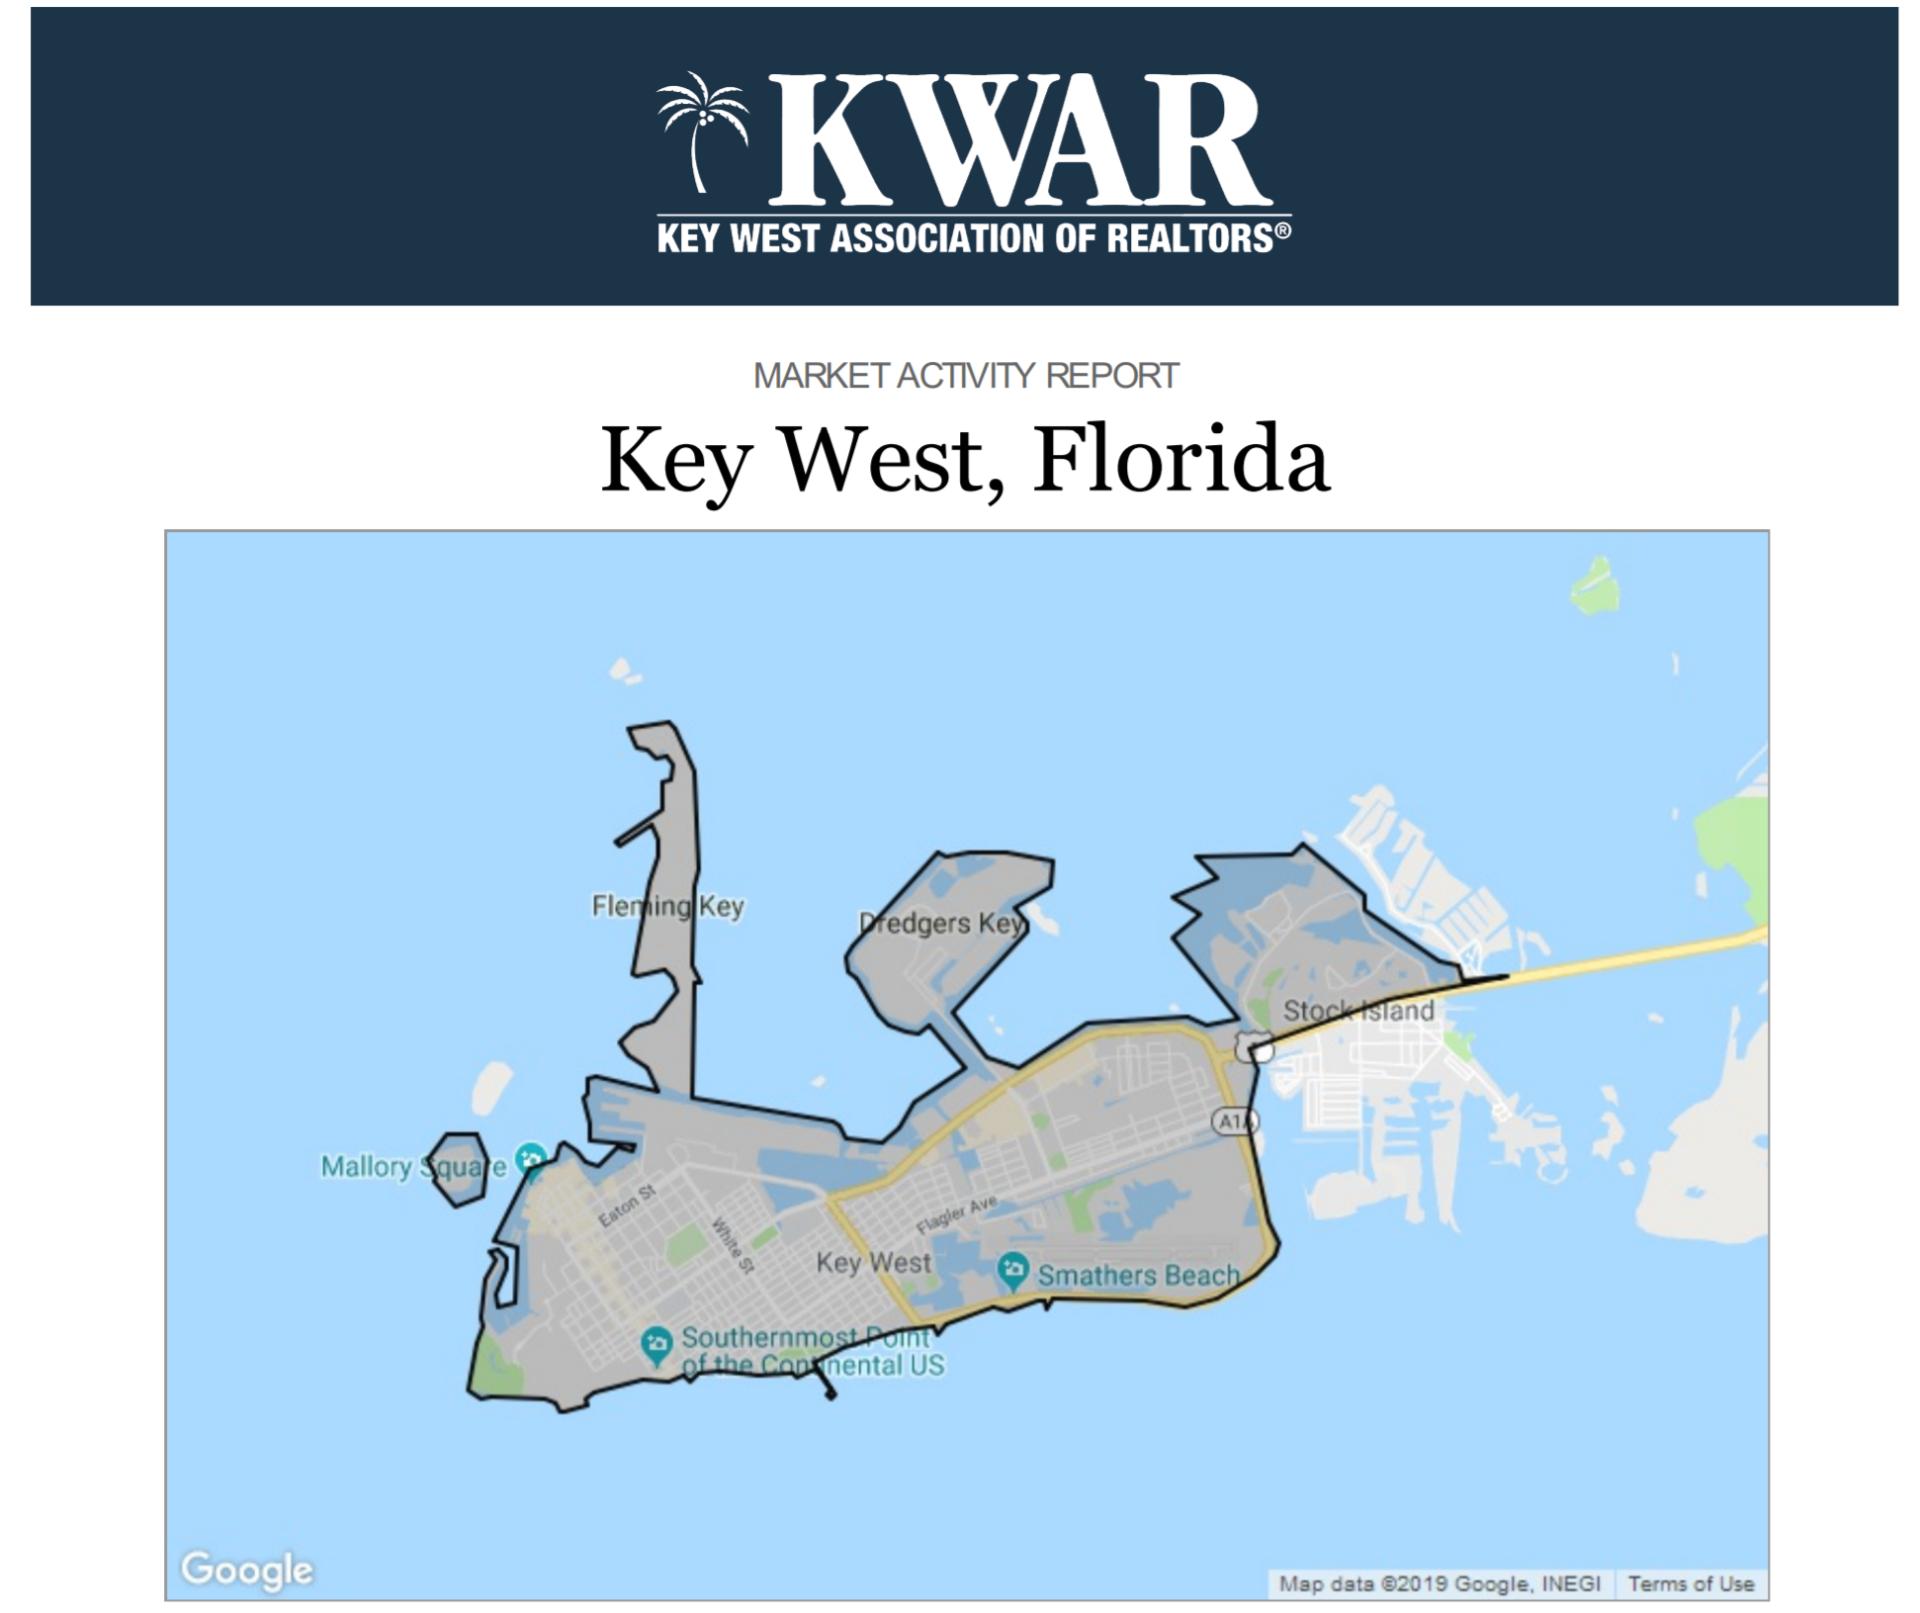 Key West Market Activity Report